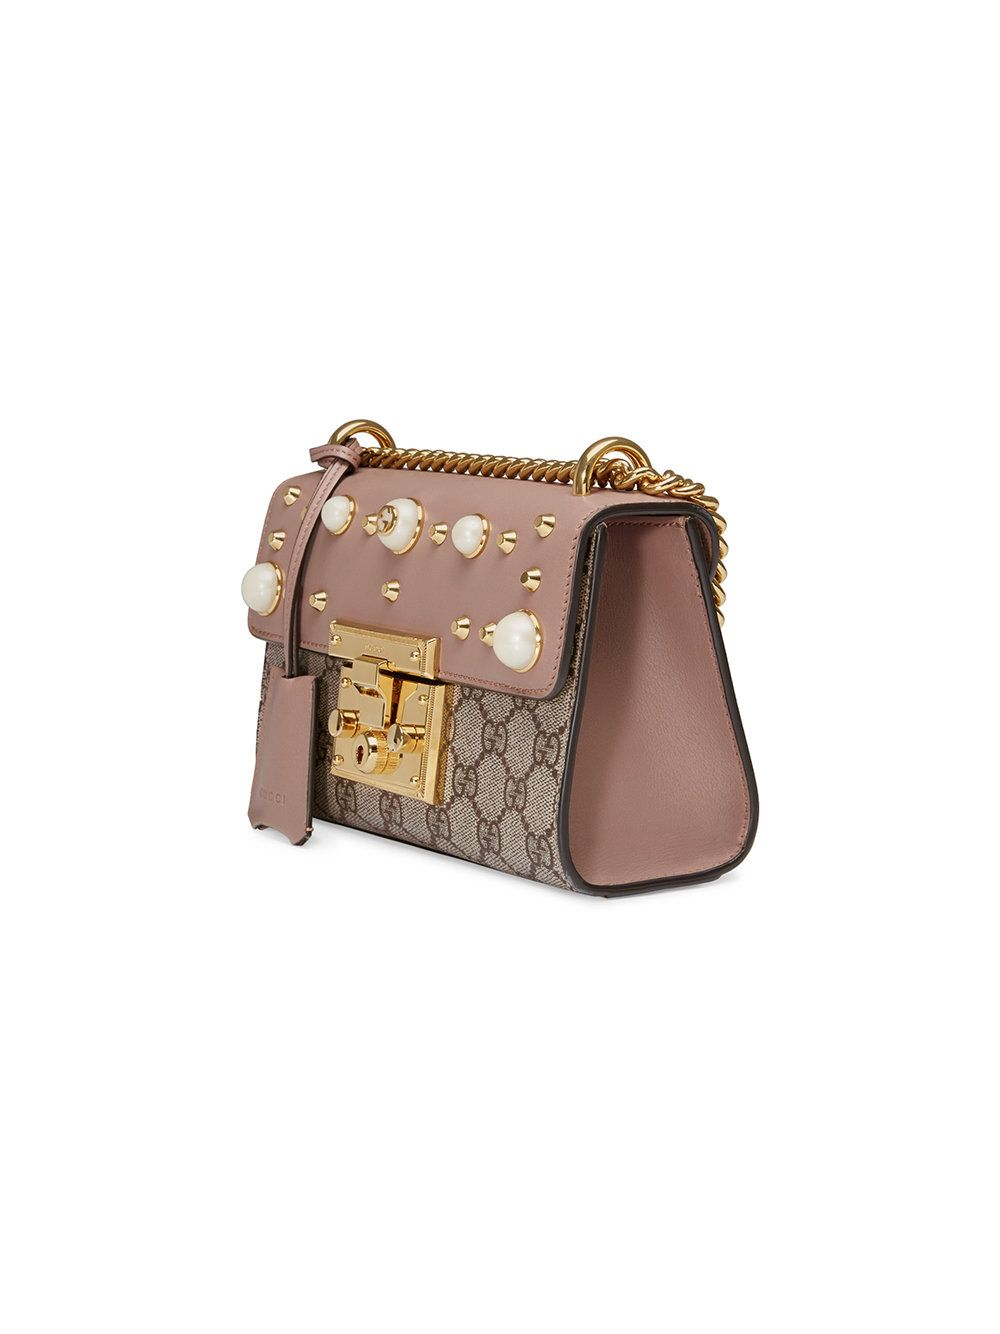 43dd3f88 Gucci Padlock studded GG Supreme shoulder bag | Purses, handbags ...